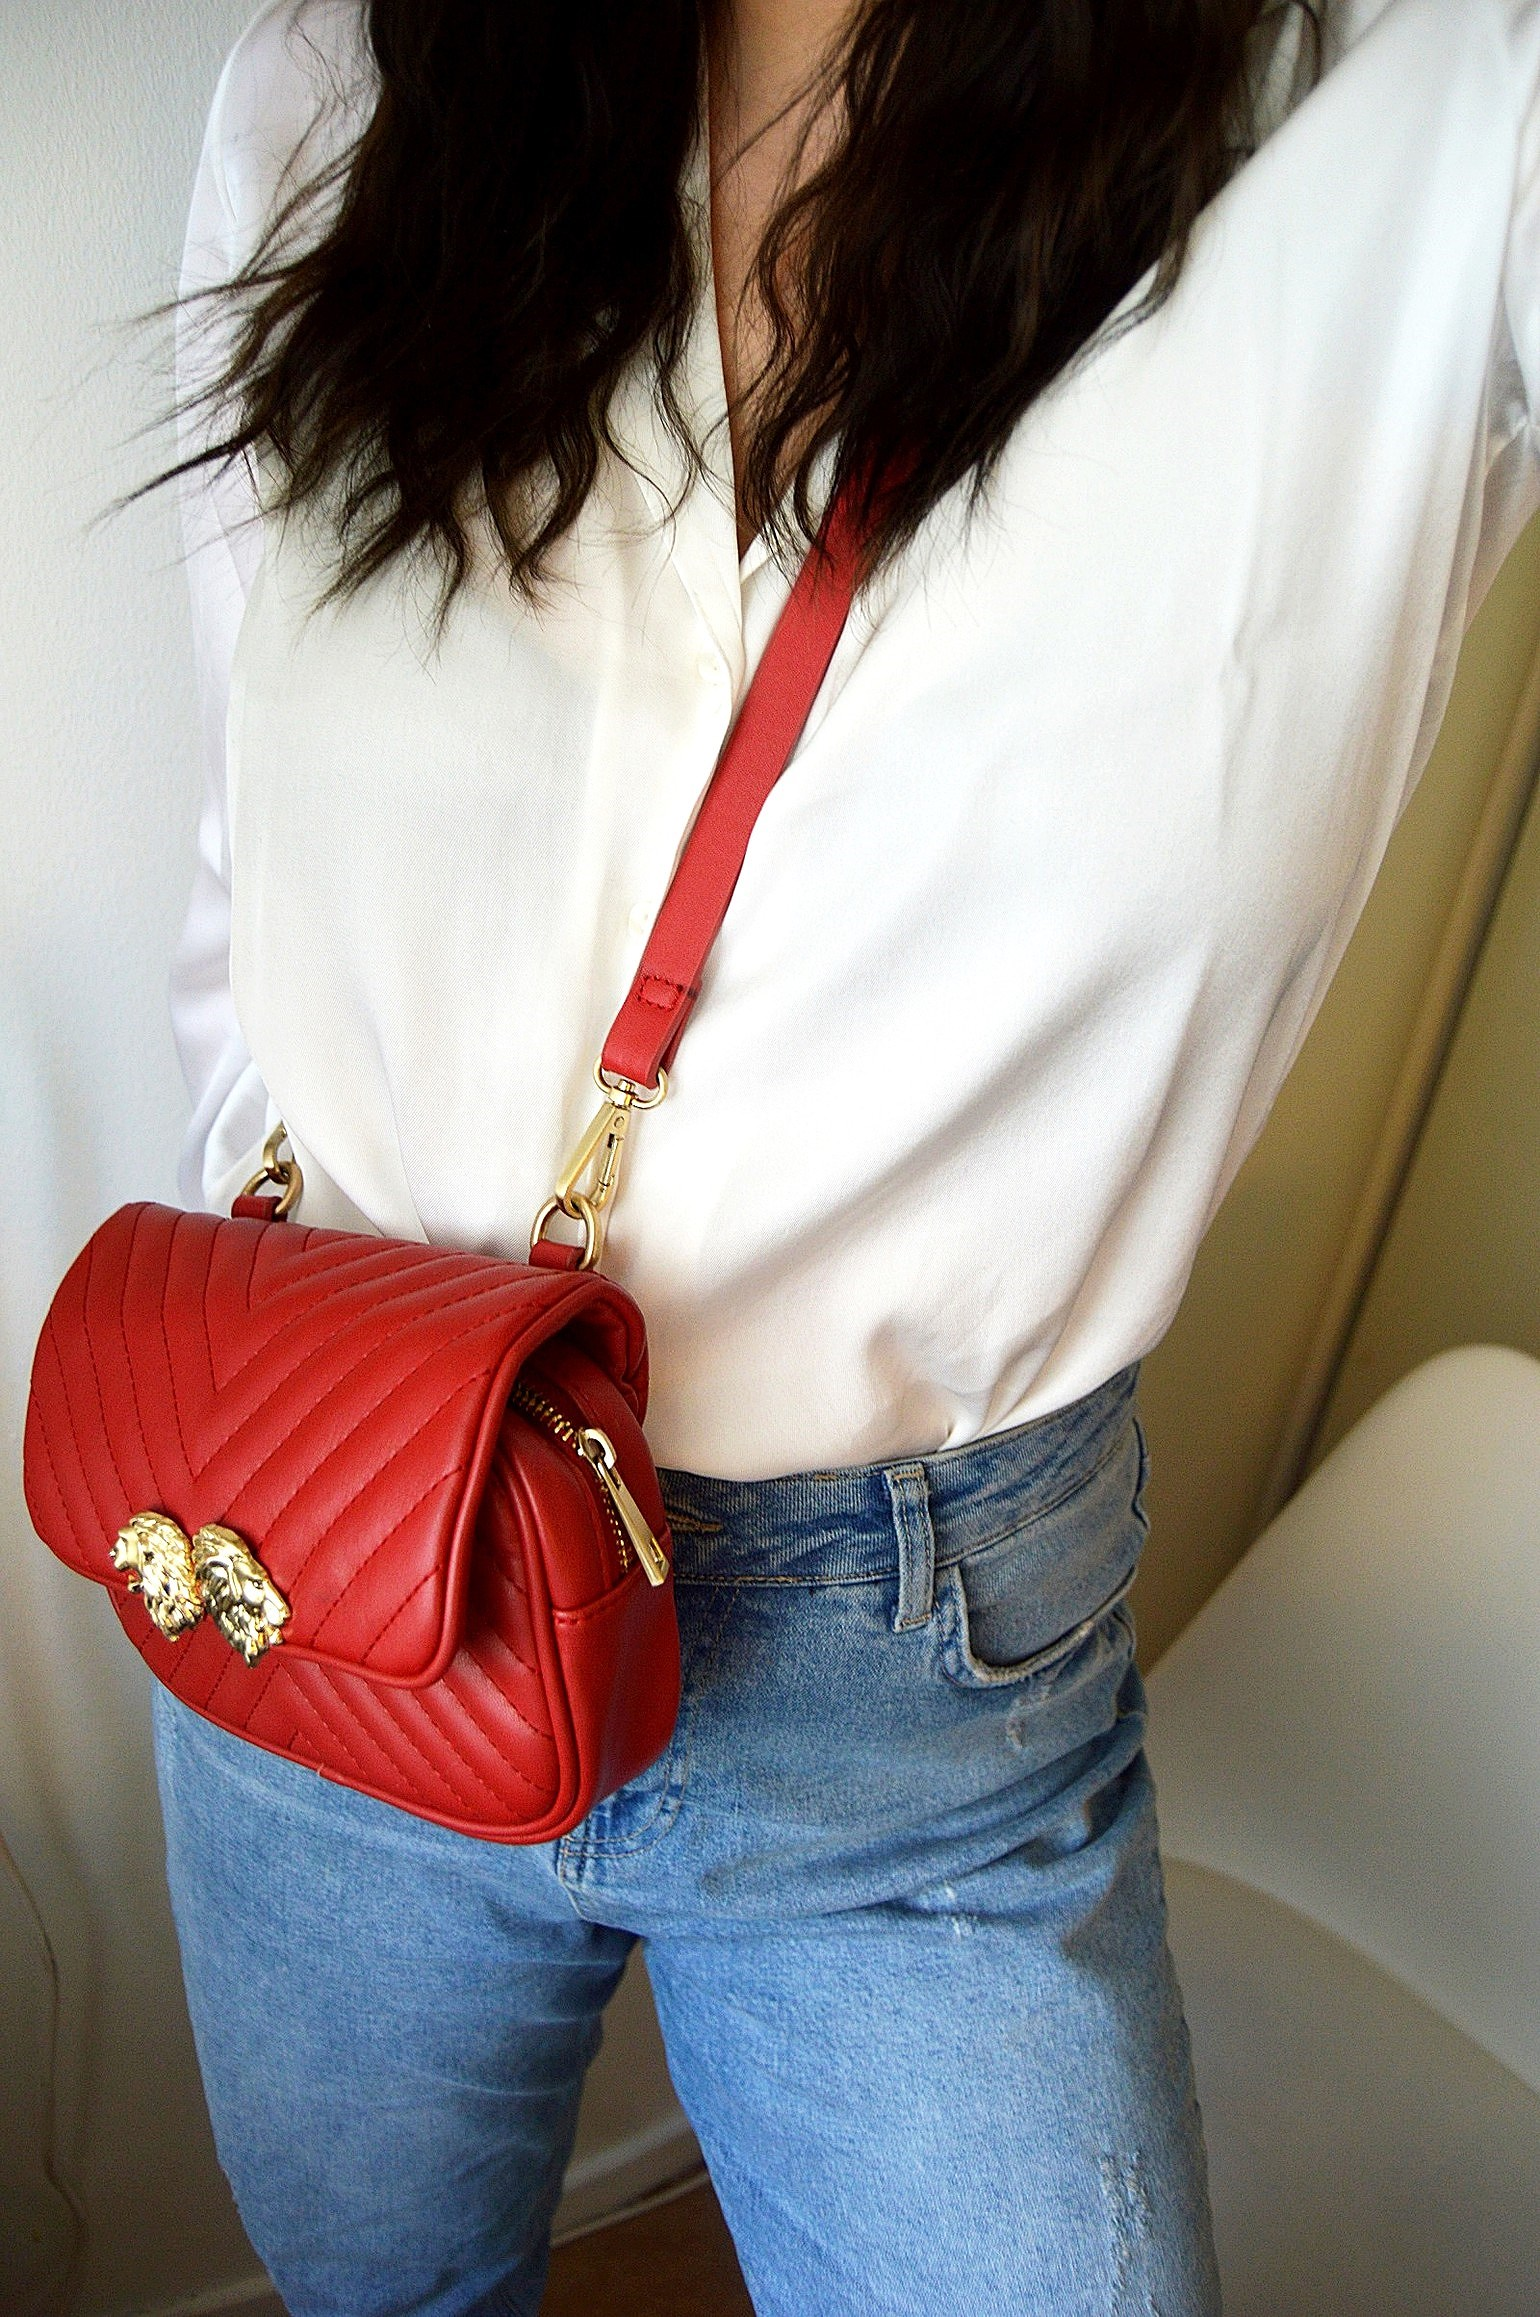 White shirt, red bag, blue jeans.